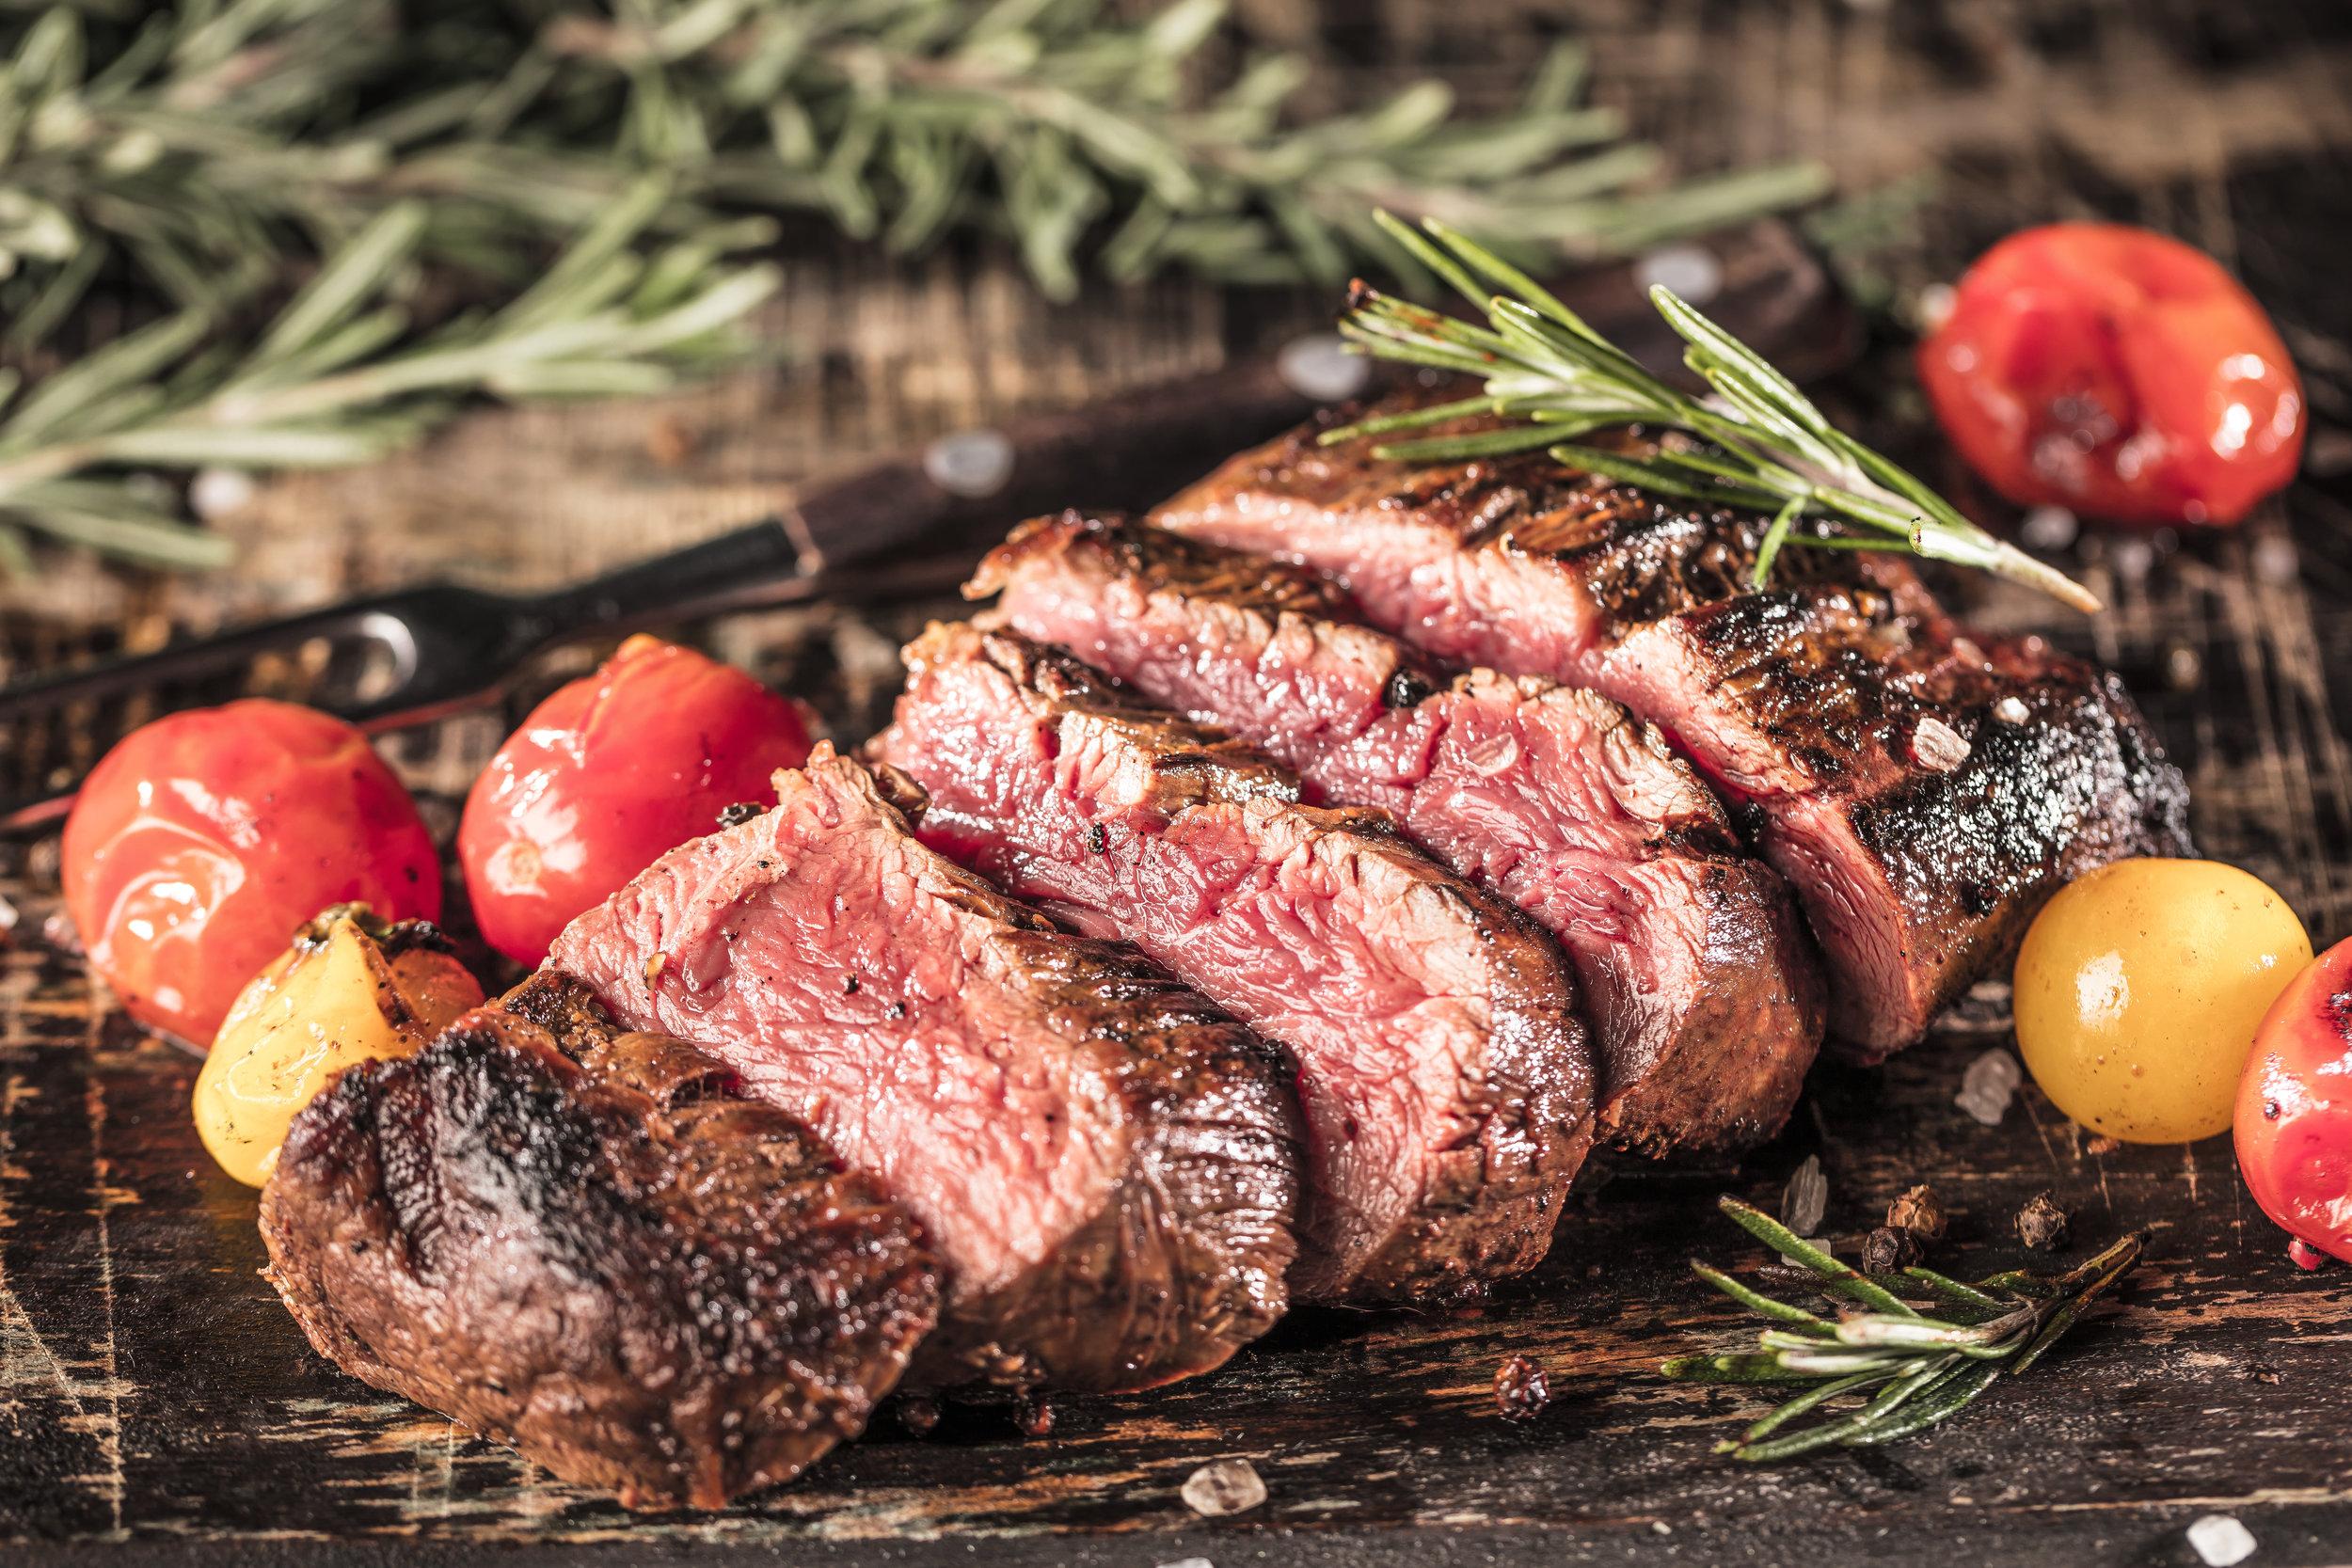 steak and cherry tomatoes